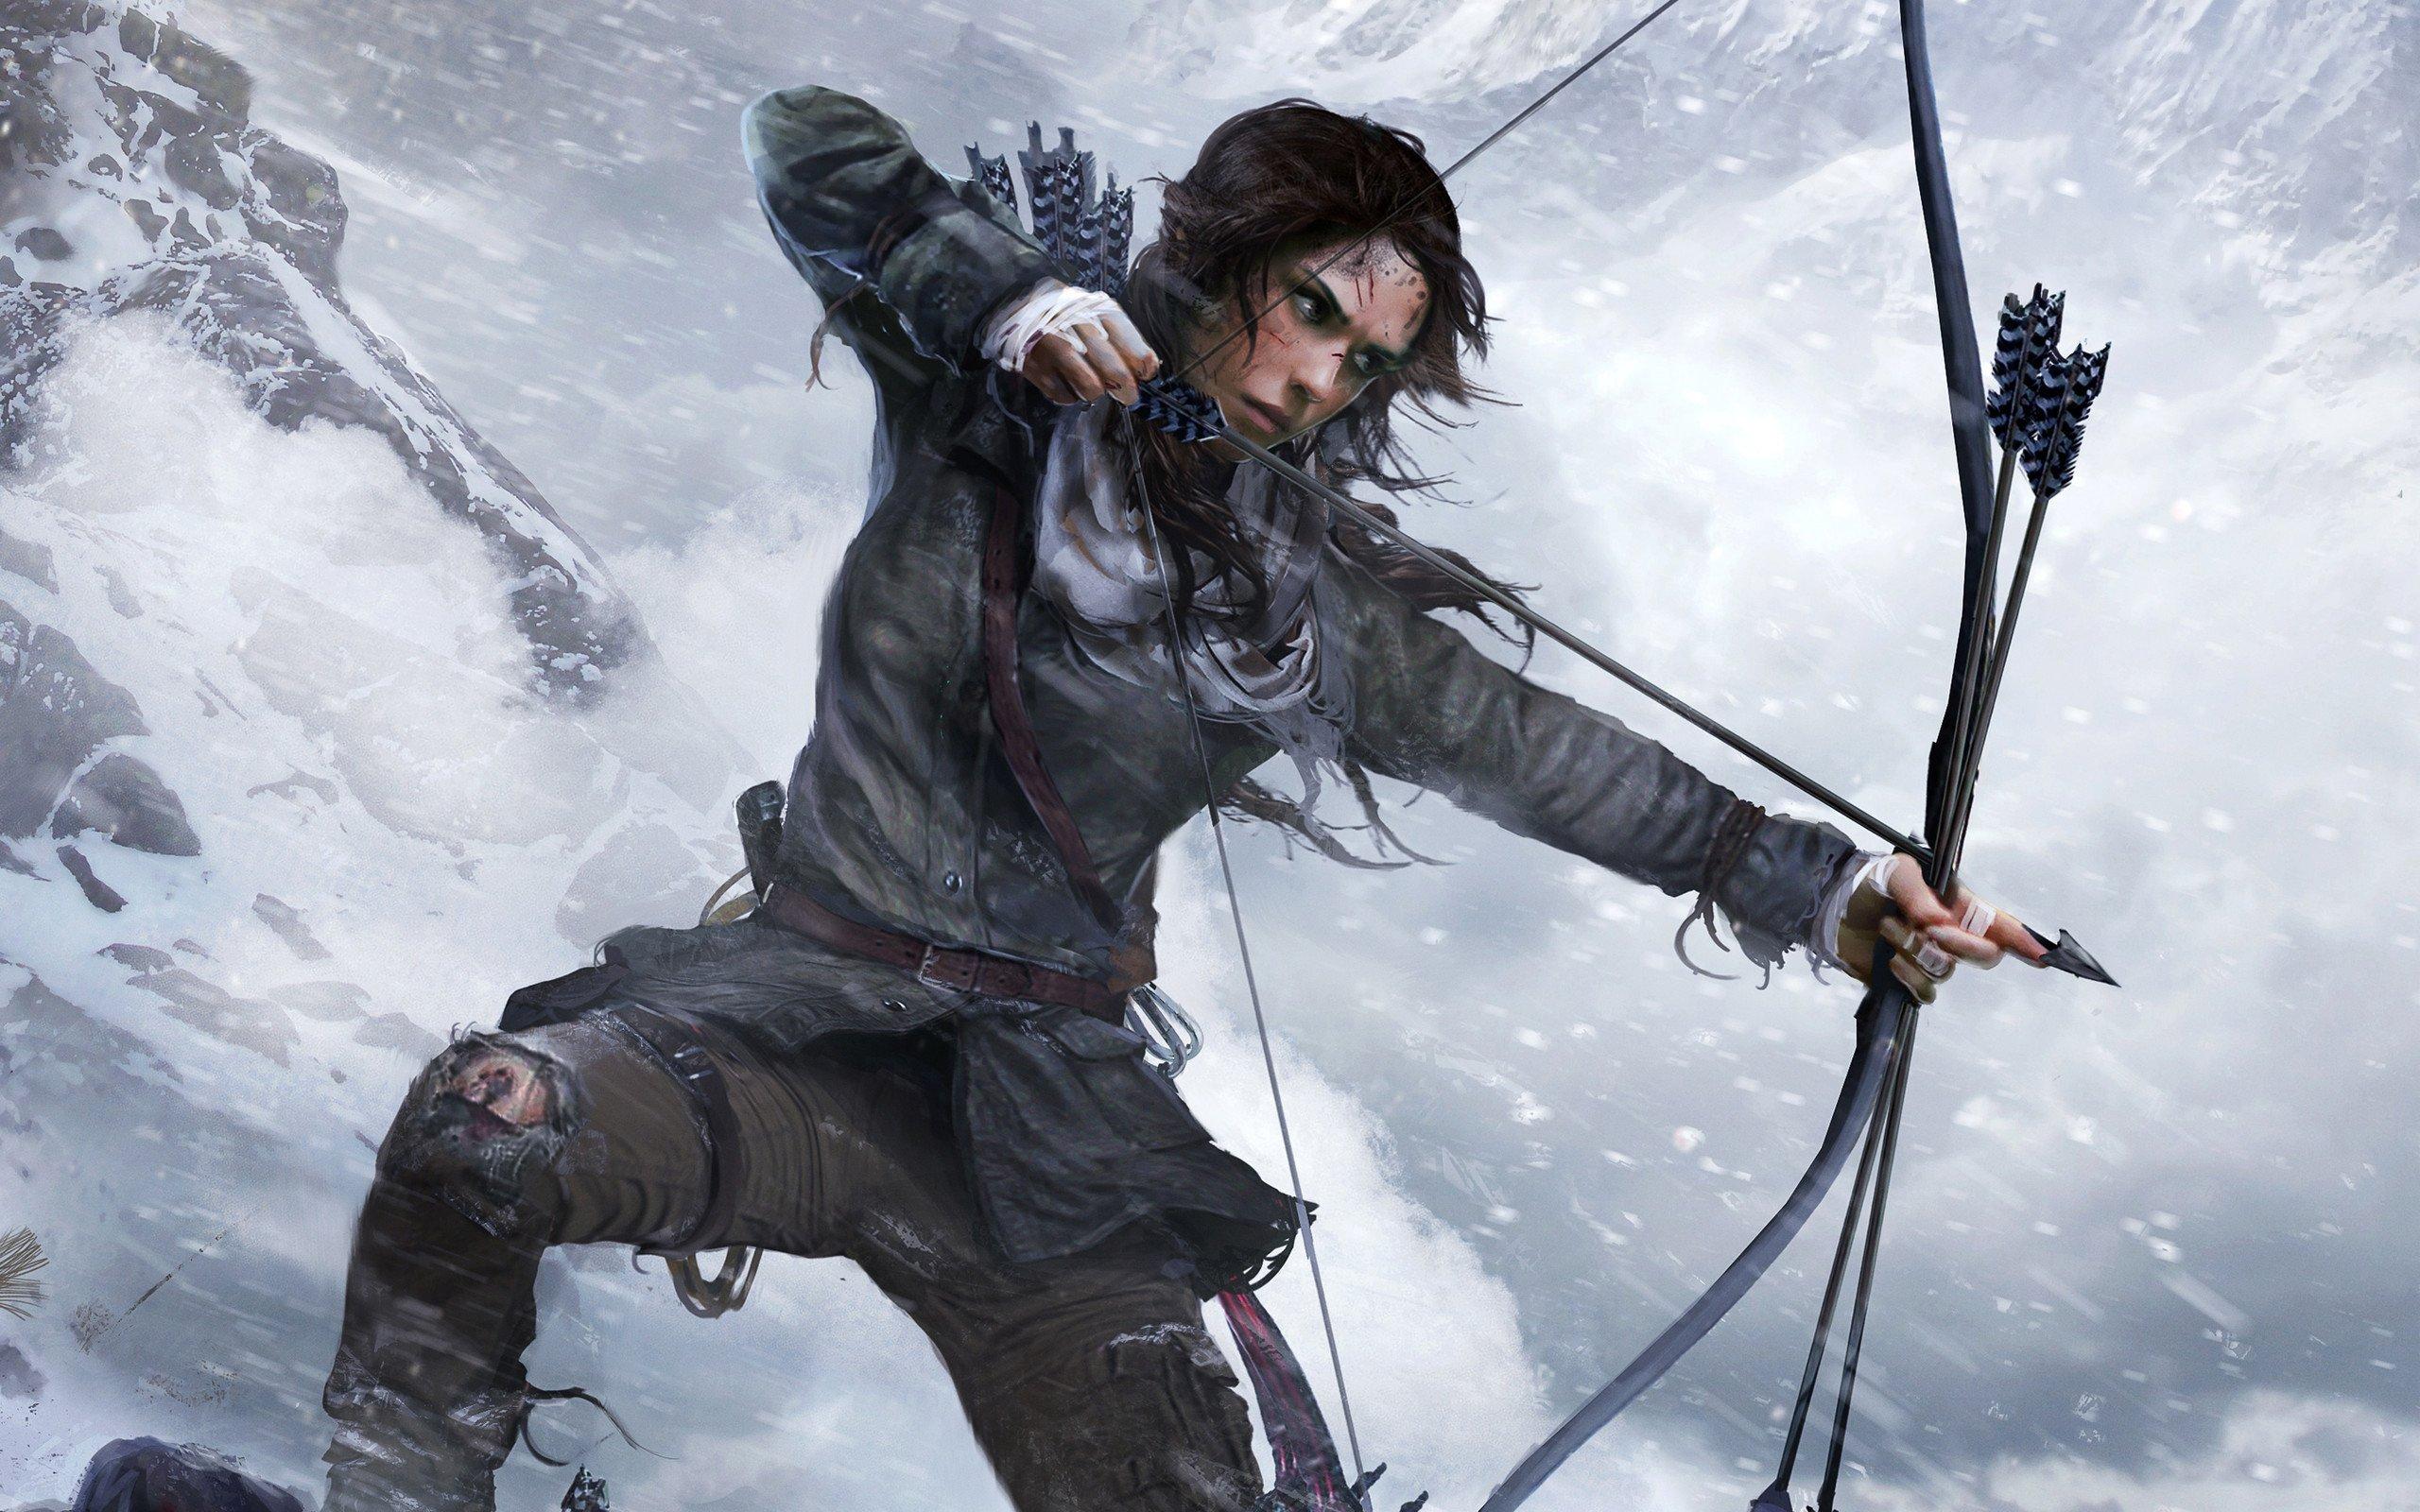 Rise of the Tomb Raider Ultra HD Duvar kağıdı